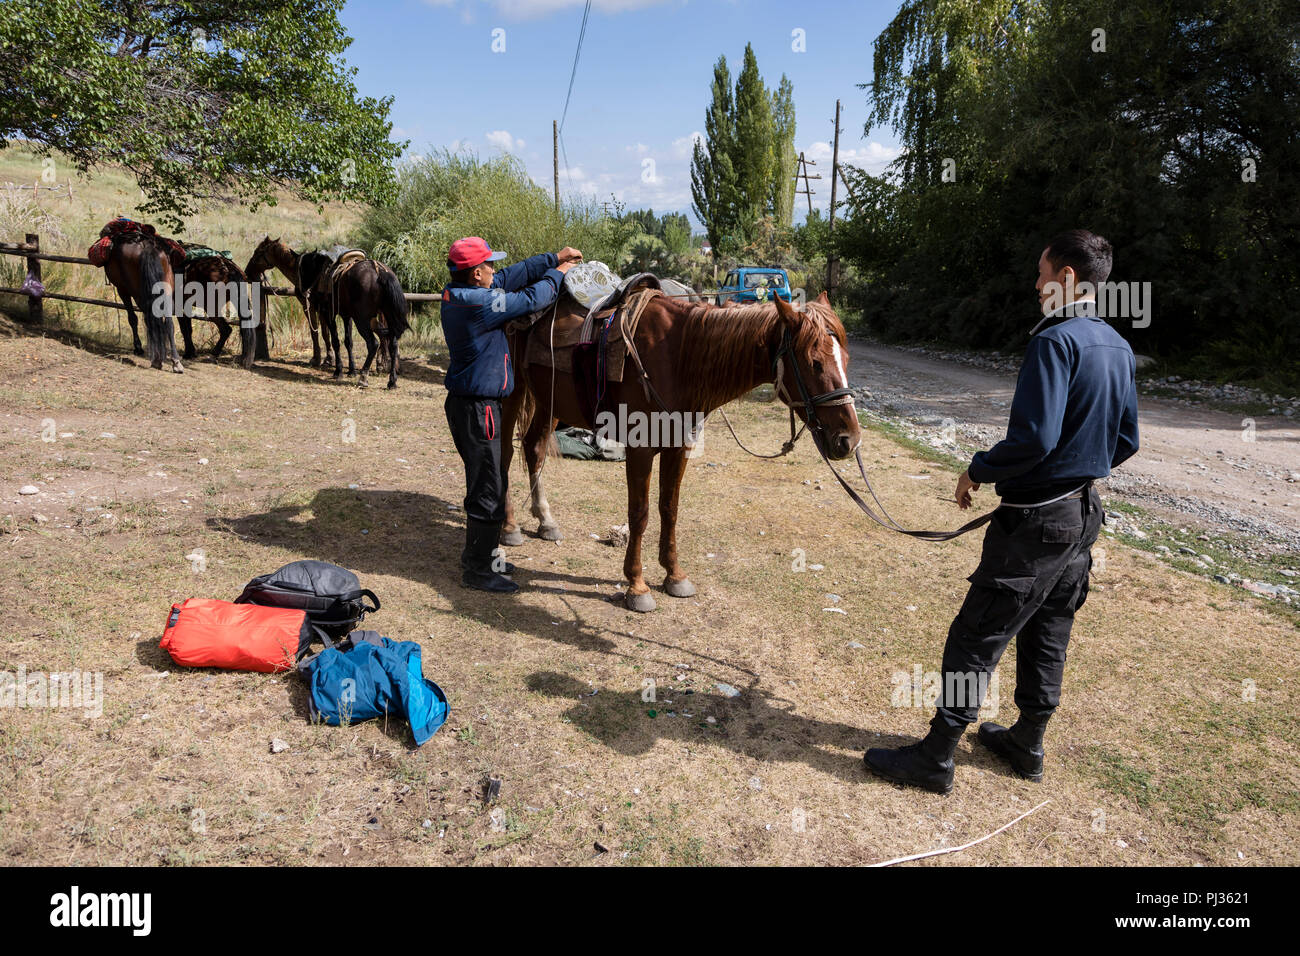 Altyn-Arashan, Kyrgyzstan, August 13 2018: Saddling the horses for a horse trek from Ak-Suu to Altyn-Arashan near Karakol - Stock Image